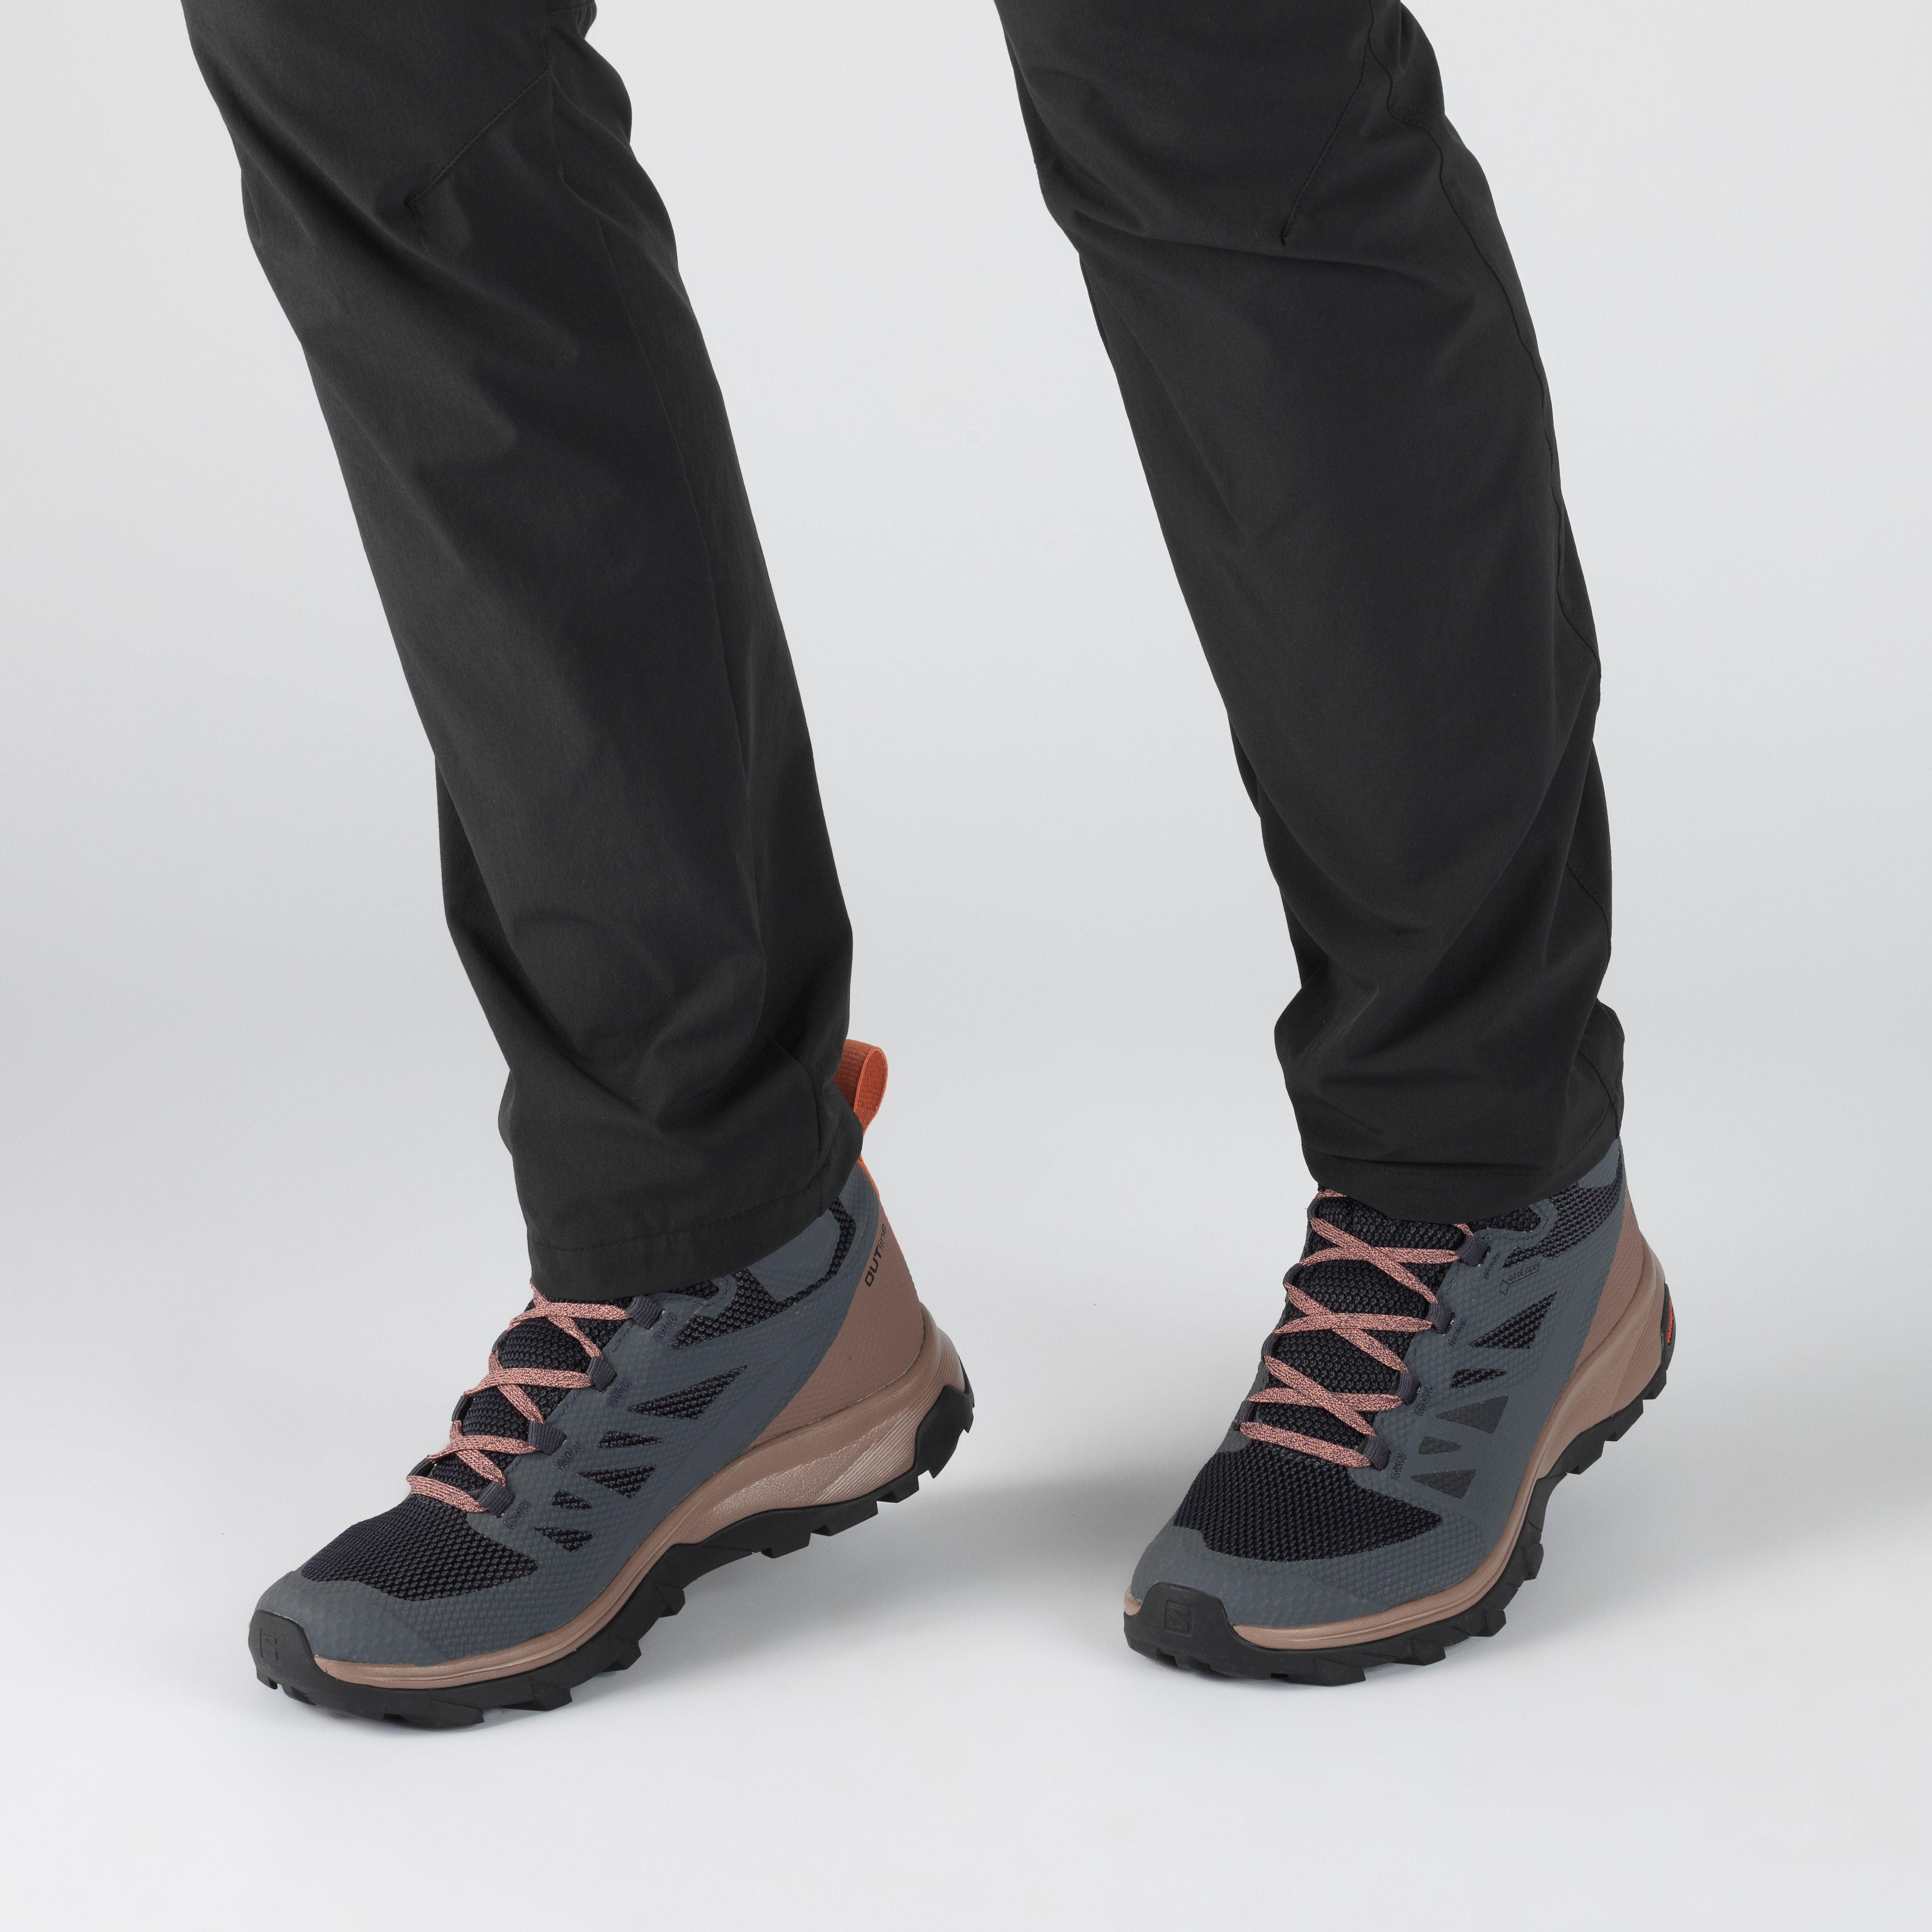 salomon outline mid gtx hiking boot - women's normal